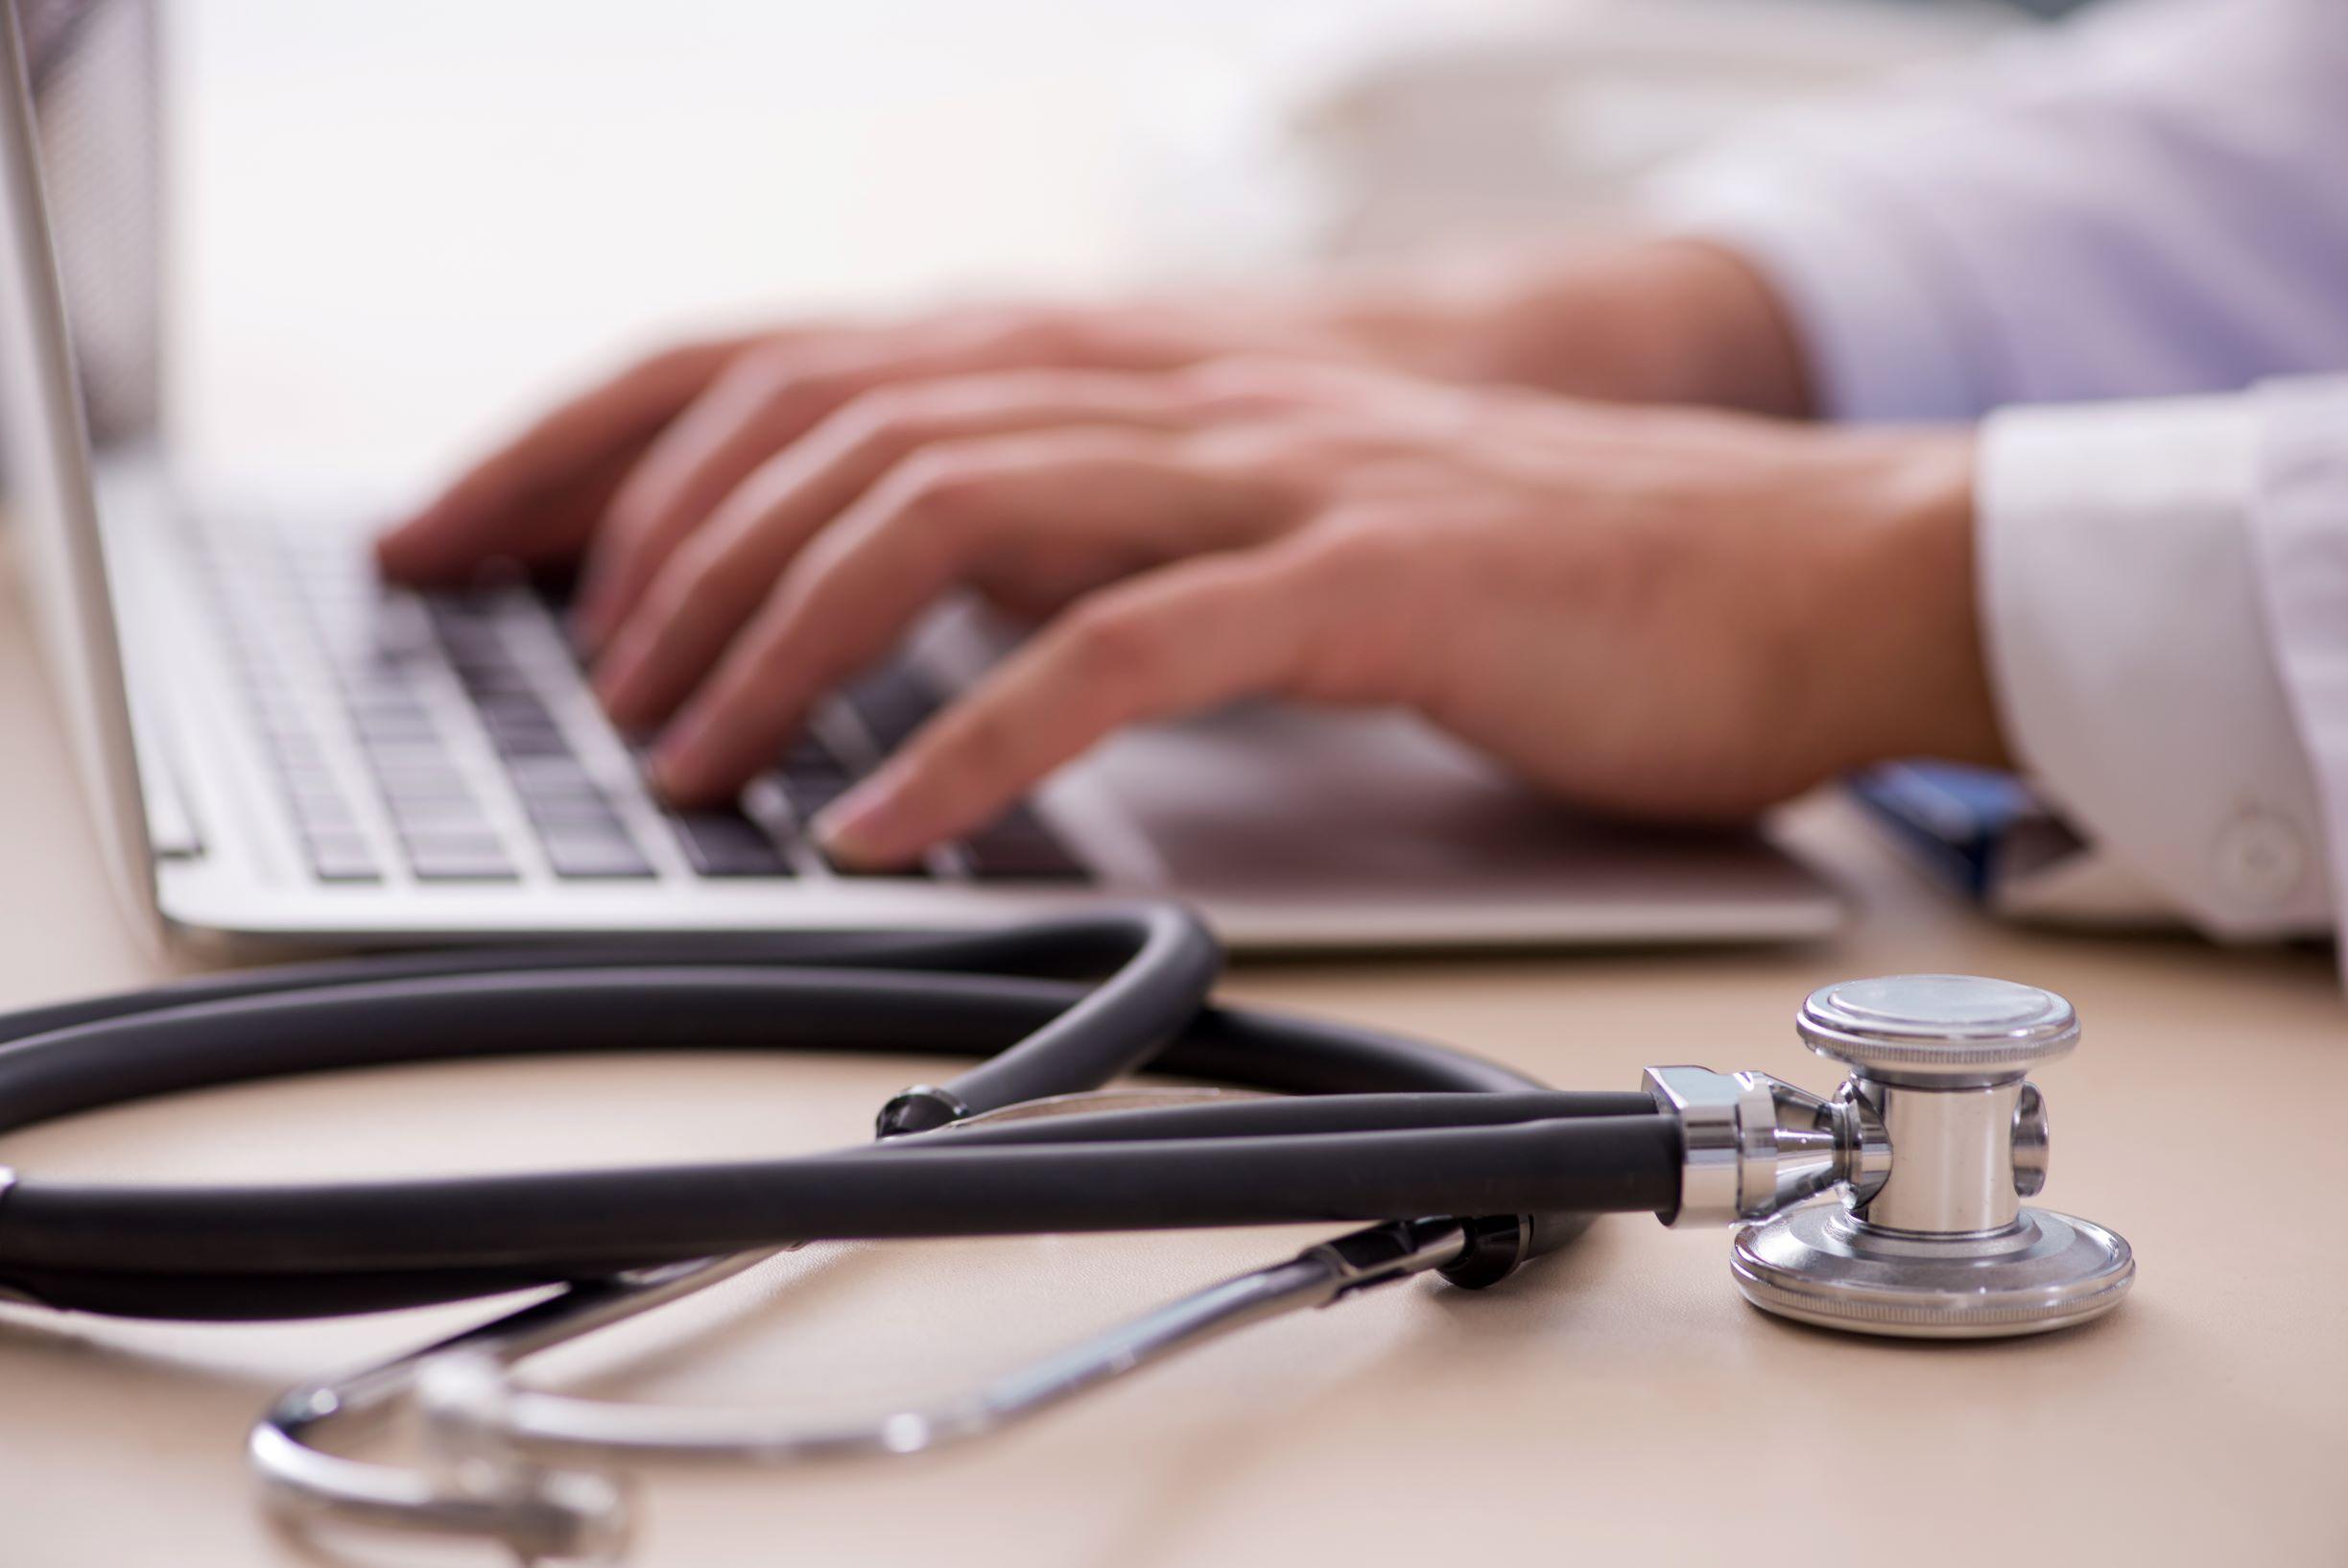 Anti-CCP and Diagnosing Rheumatoid Arthritis